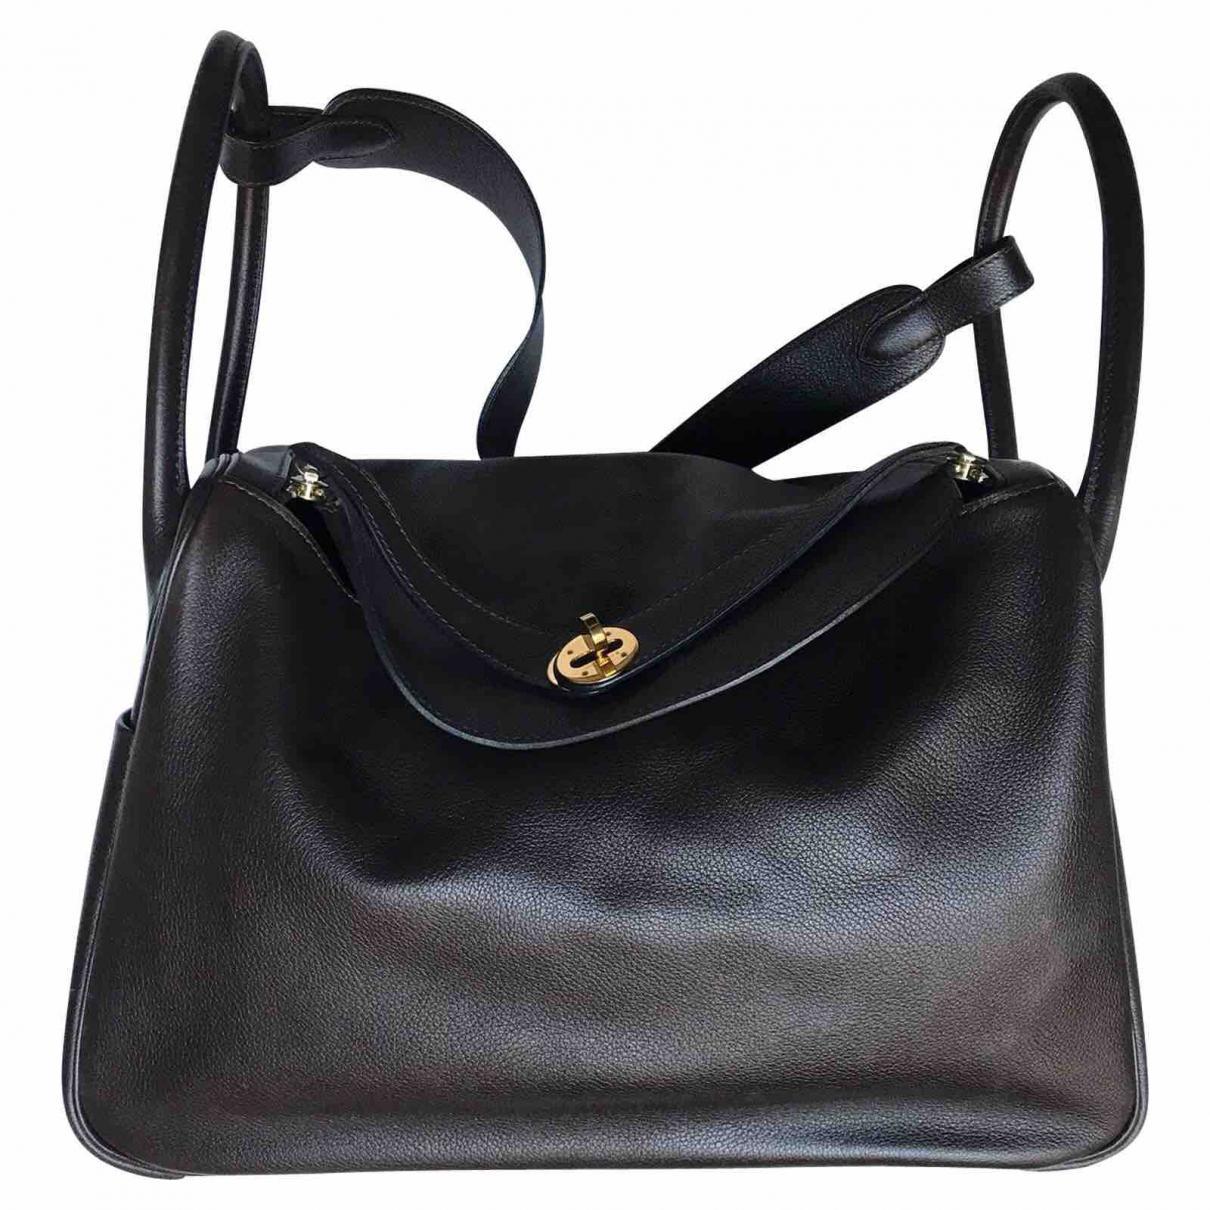 71ca8599fbd0 ... gold hardware cdd35 14f25  promo code hermès. womens brown pre owned lindy  leather handbag fc22d 7c250